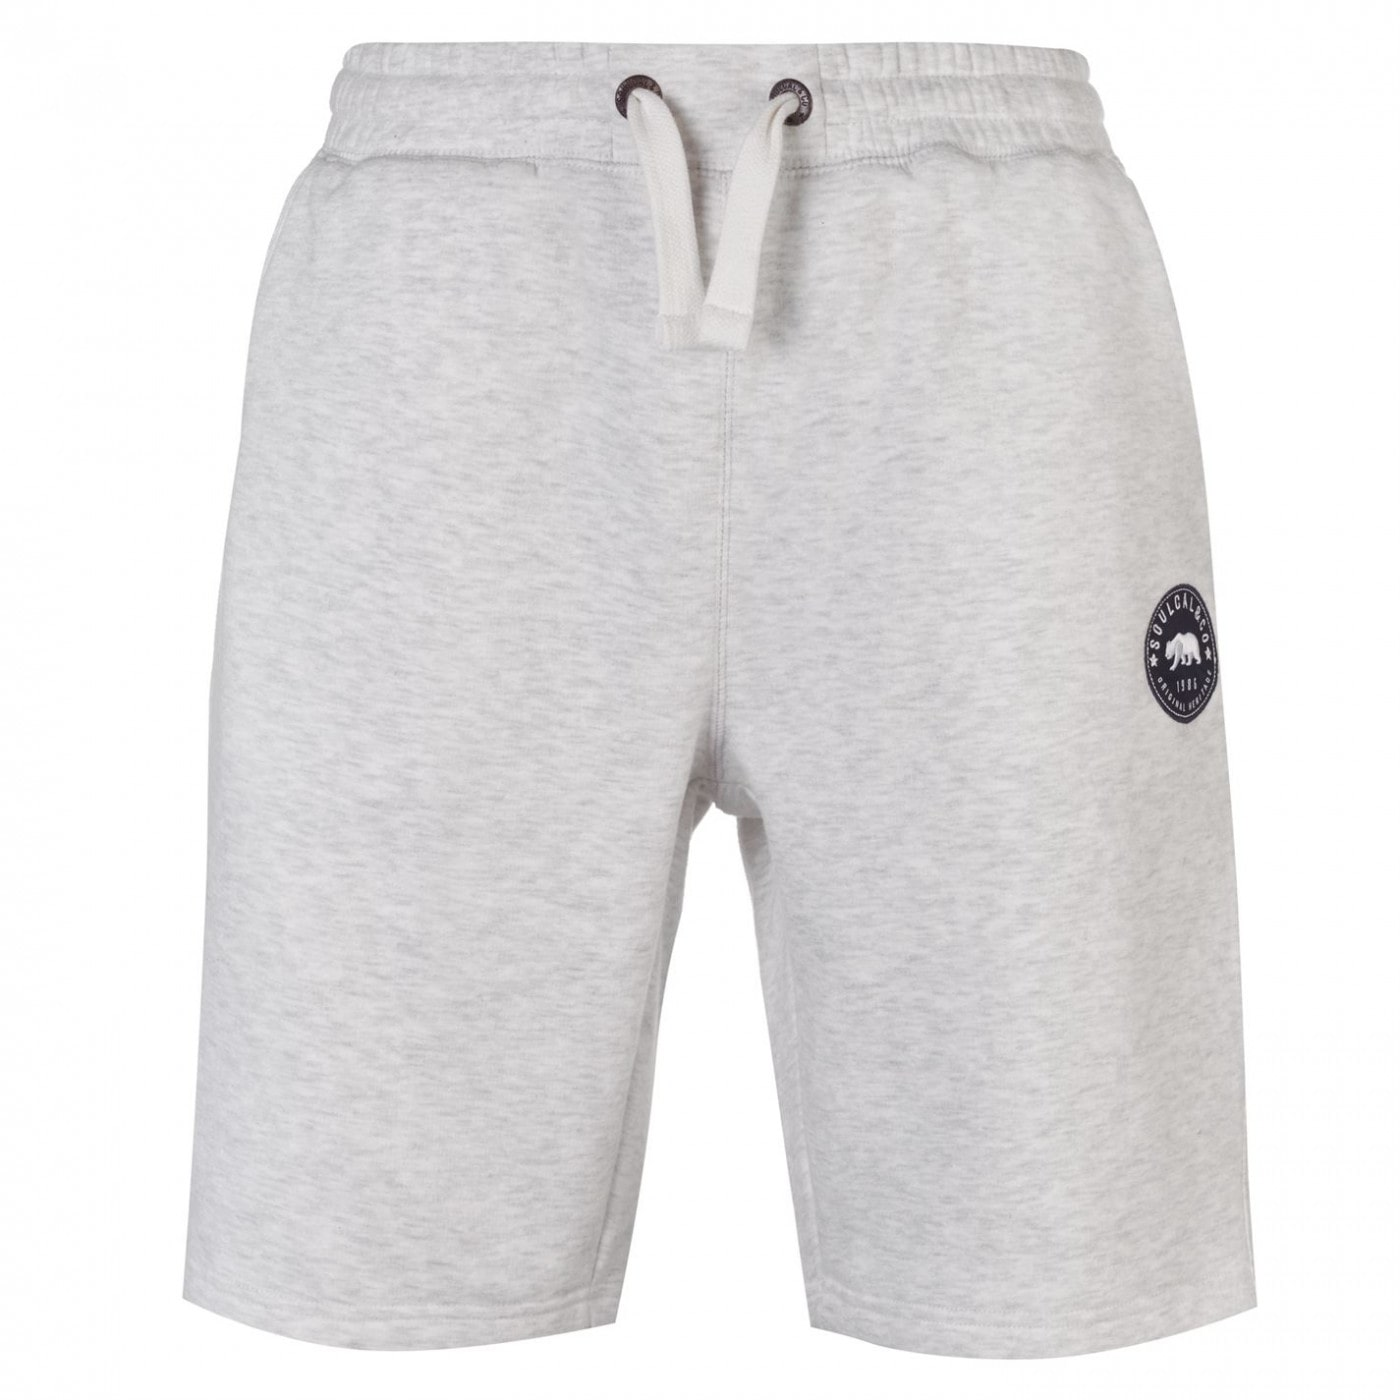 Men's shorts SoulCal Signature